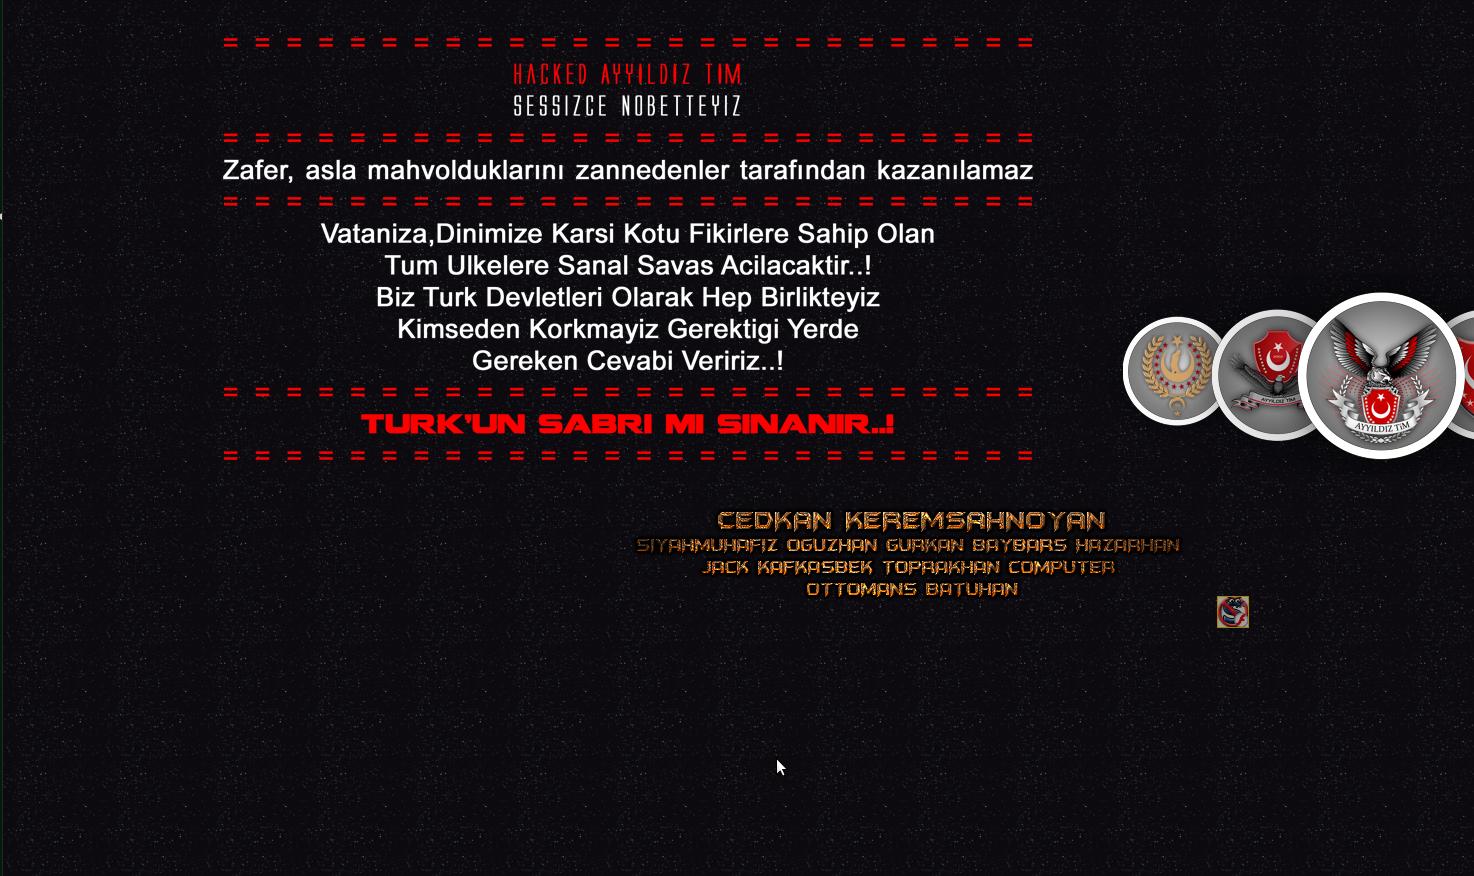 Defaced-Website-Hackd-Turk